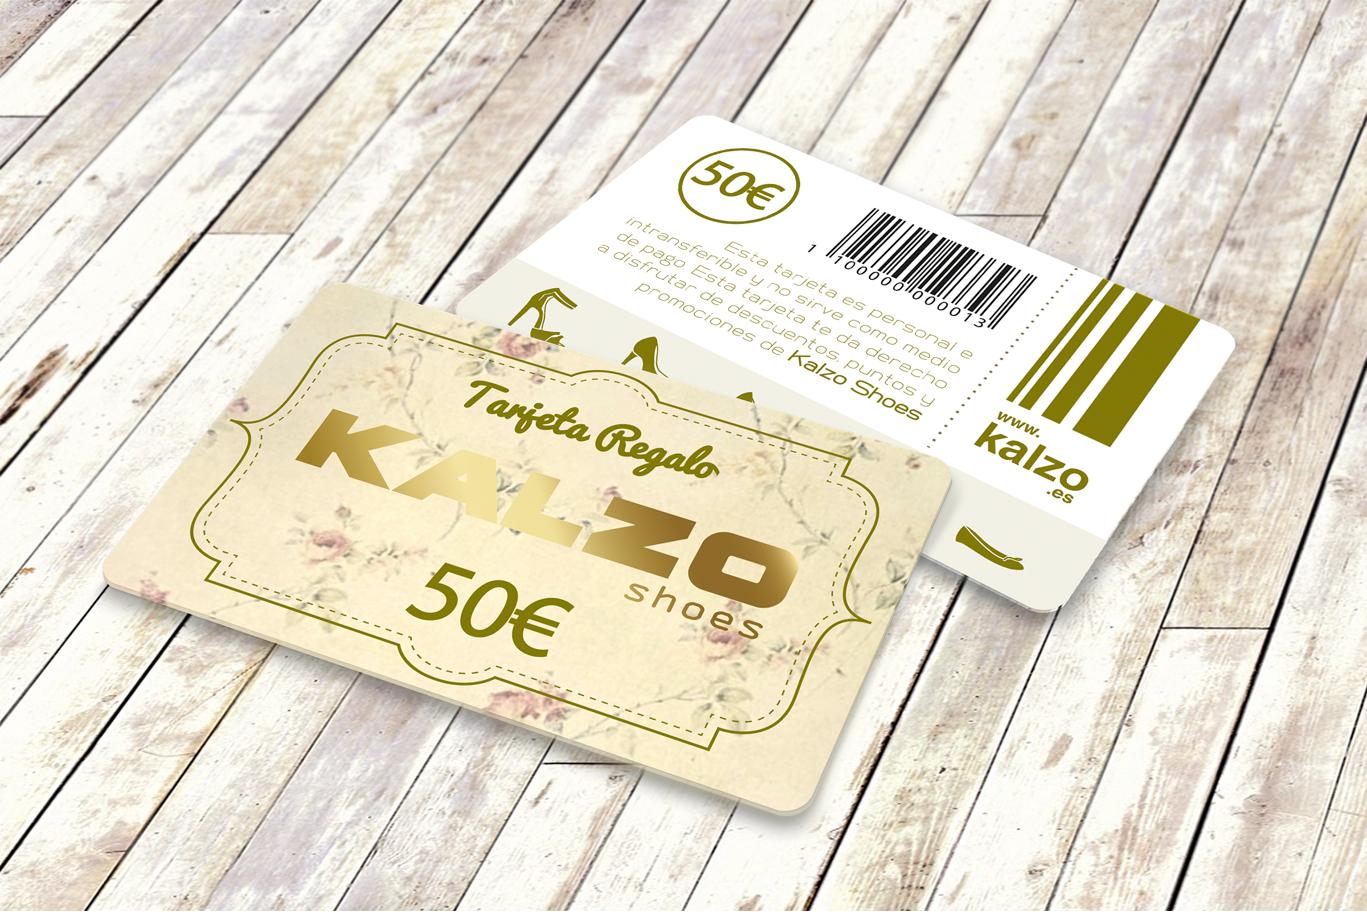 Diseño gráfico, diseño grafico Albacete e imprenta de tarjetas pvc de regalo de zapaterias Kalzo